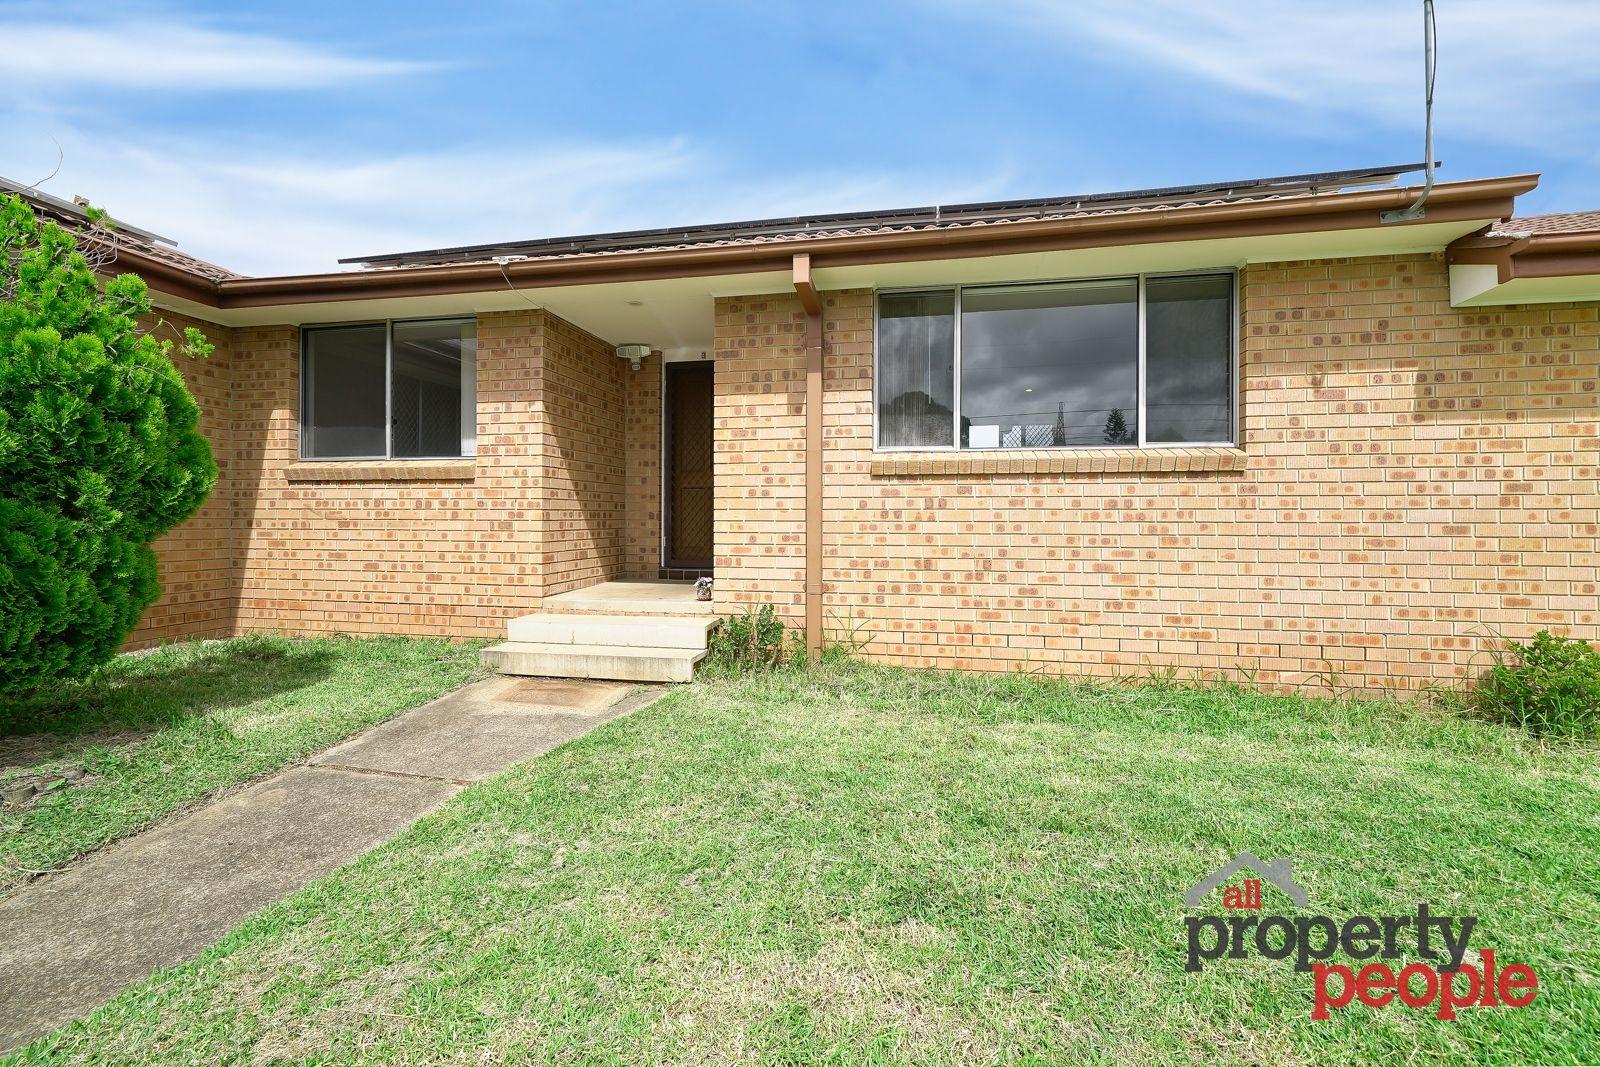 3/5-7 Foreman Street, Glenfield NSW 2167, Image 0